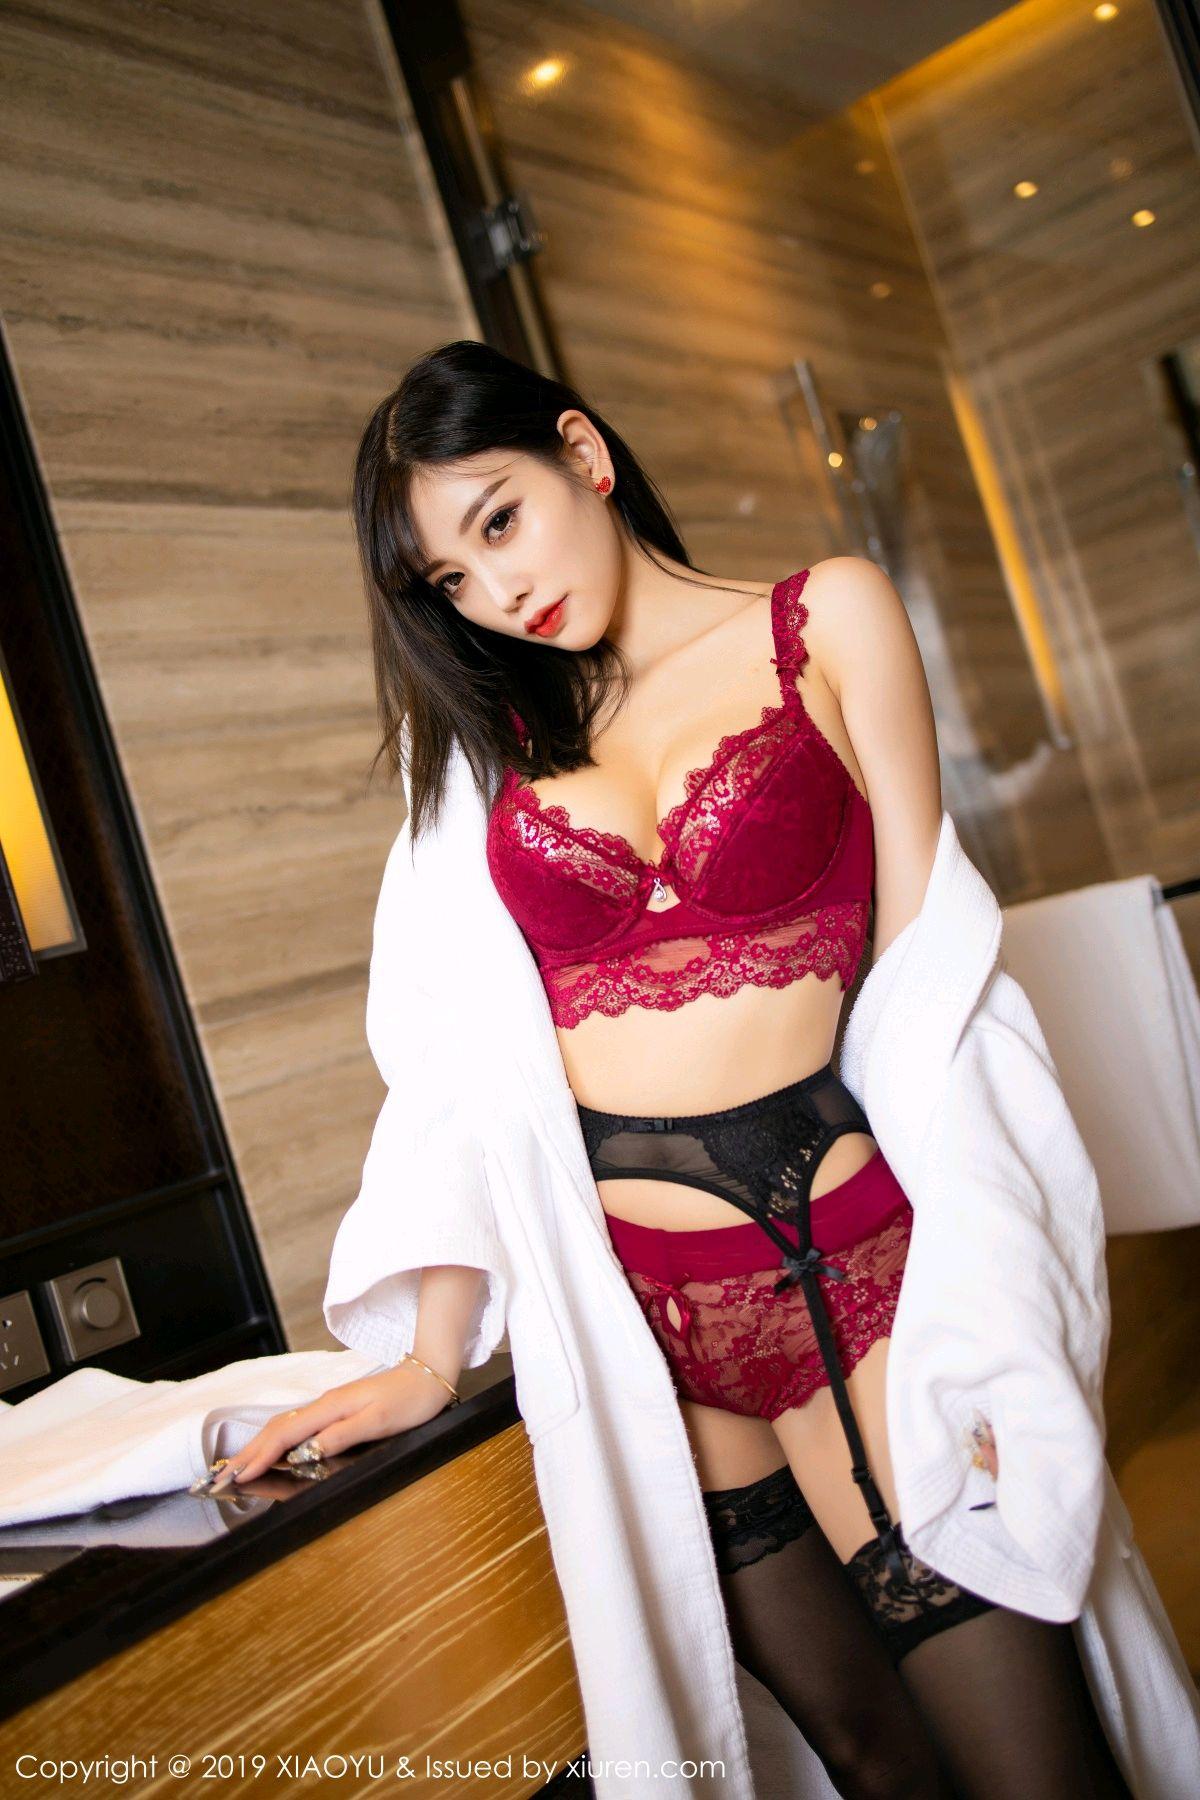 [XiaoYu] Vol.153 Yang Chen Chen 37P, Bathroom, Black Silk, Underwear, XiaoYu, Yang Chen Chen